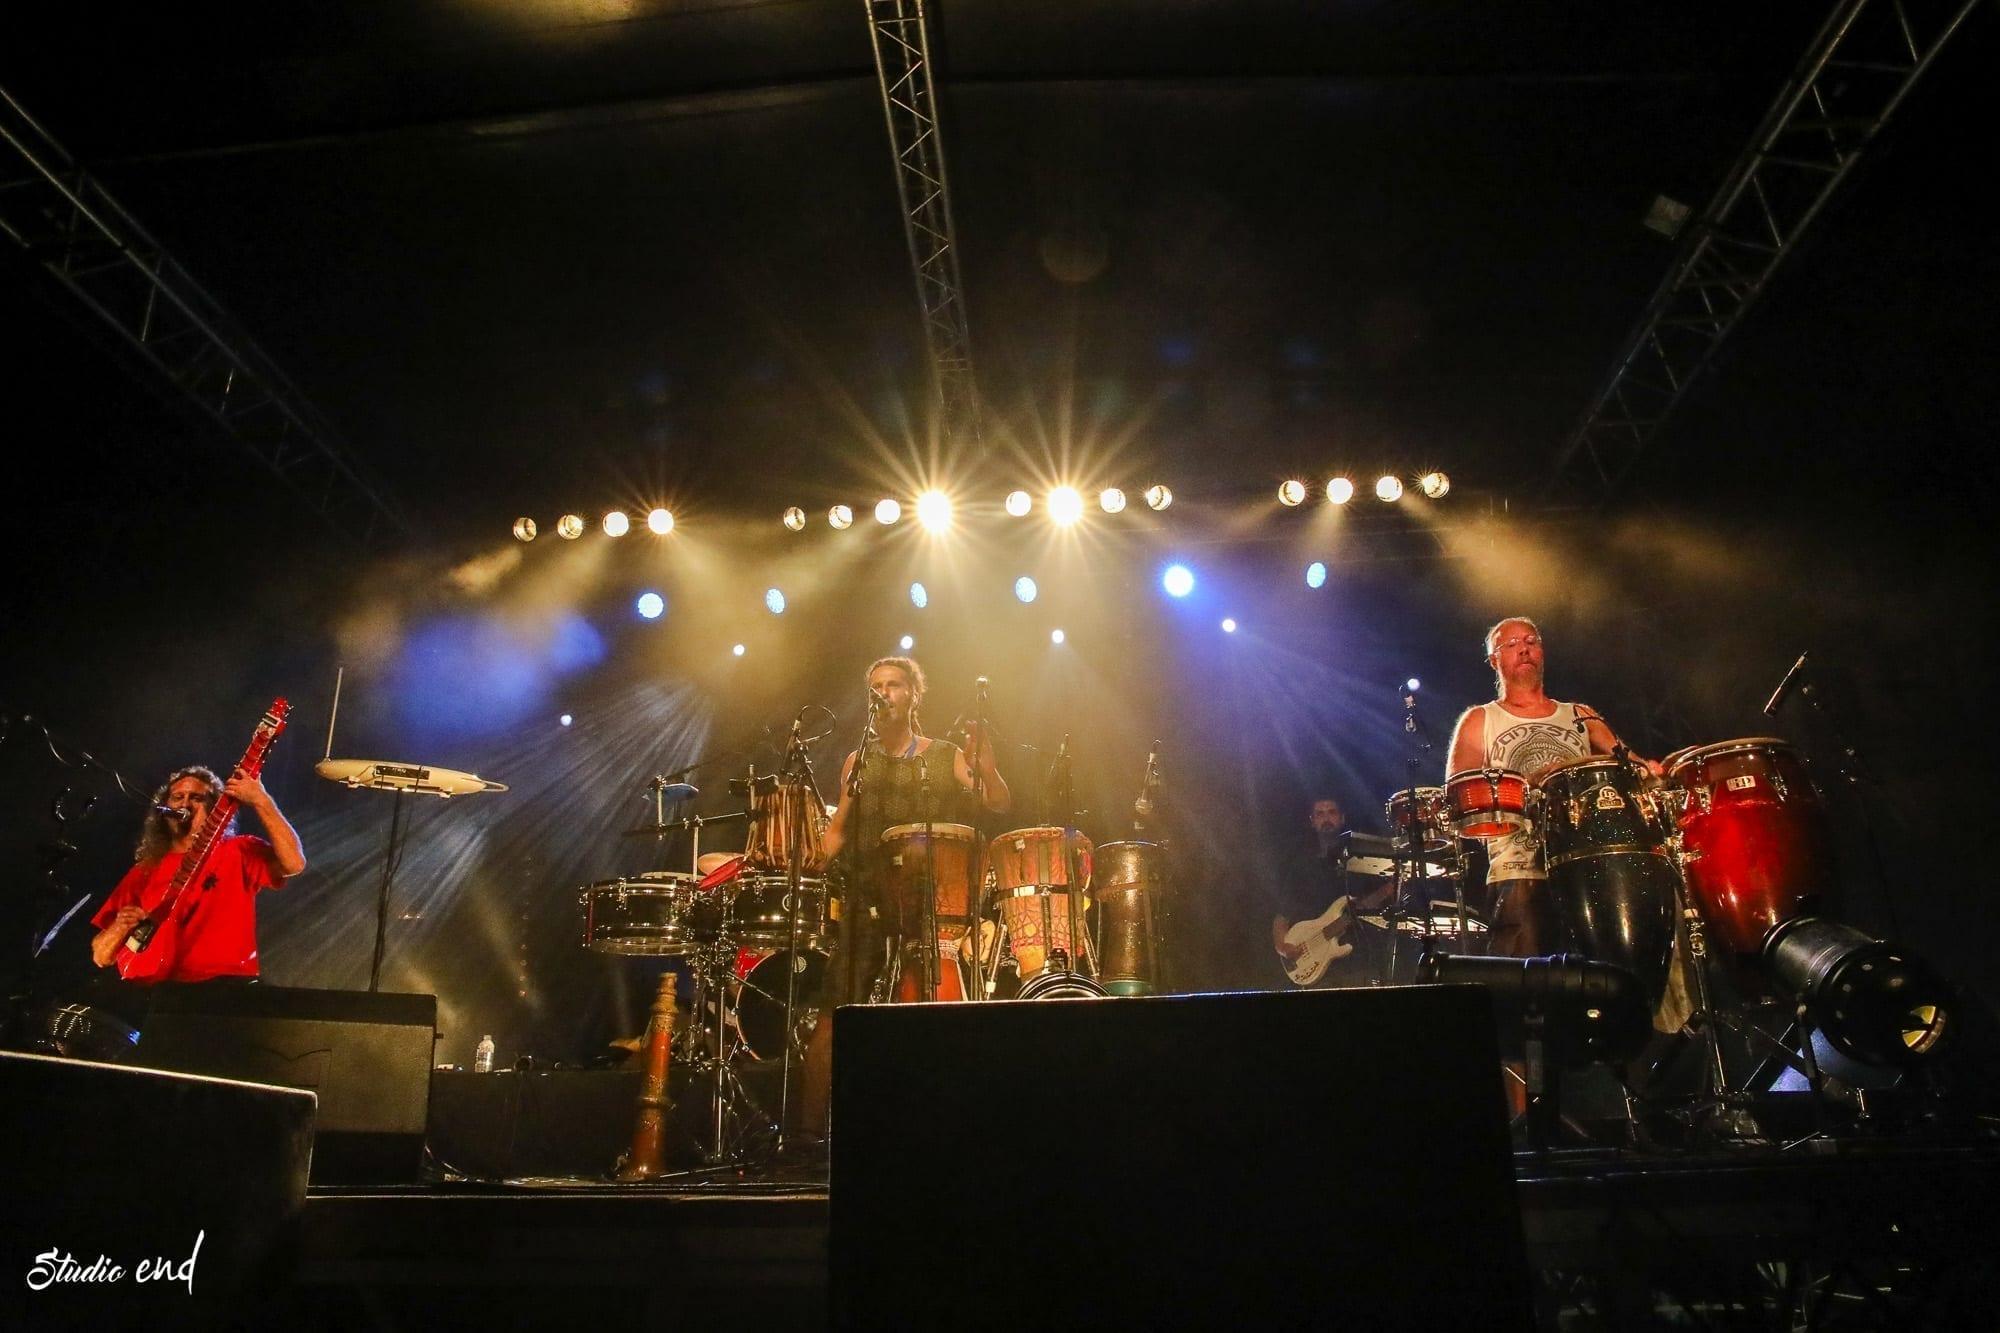 groupe Hilight Tribe en Concert live en Aveyron